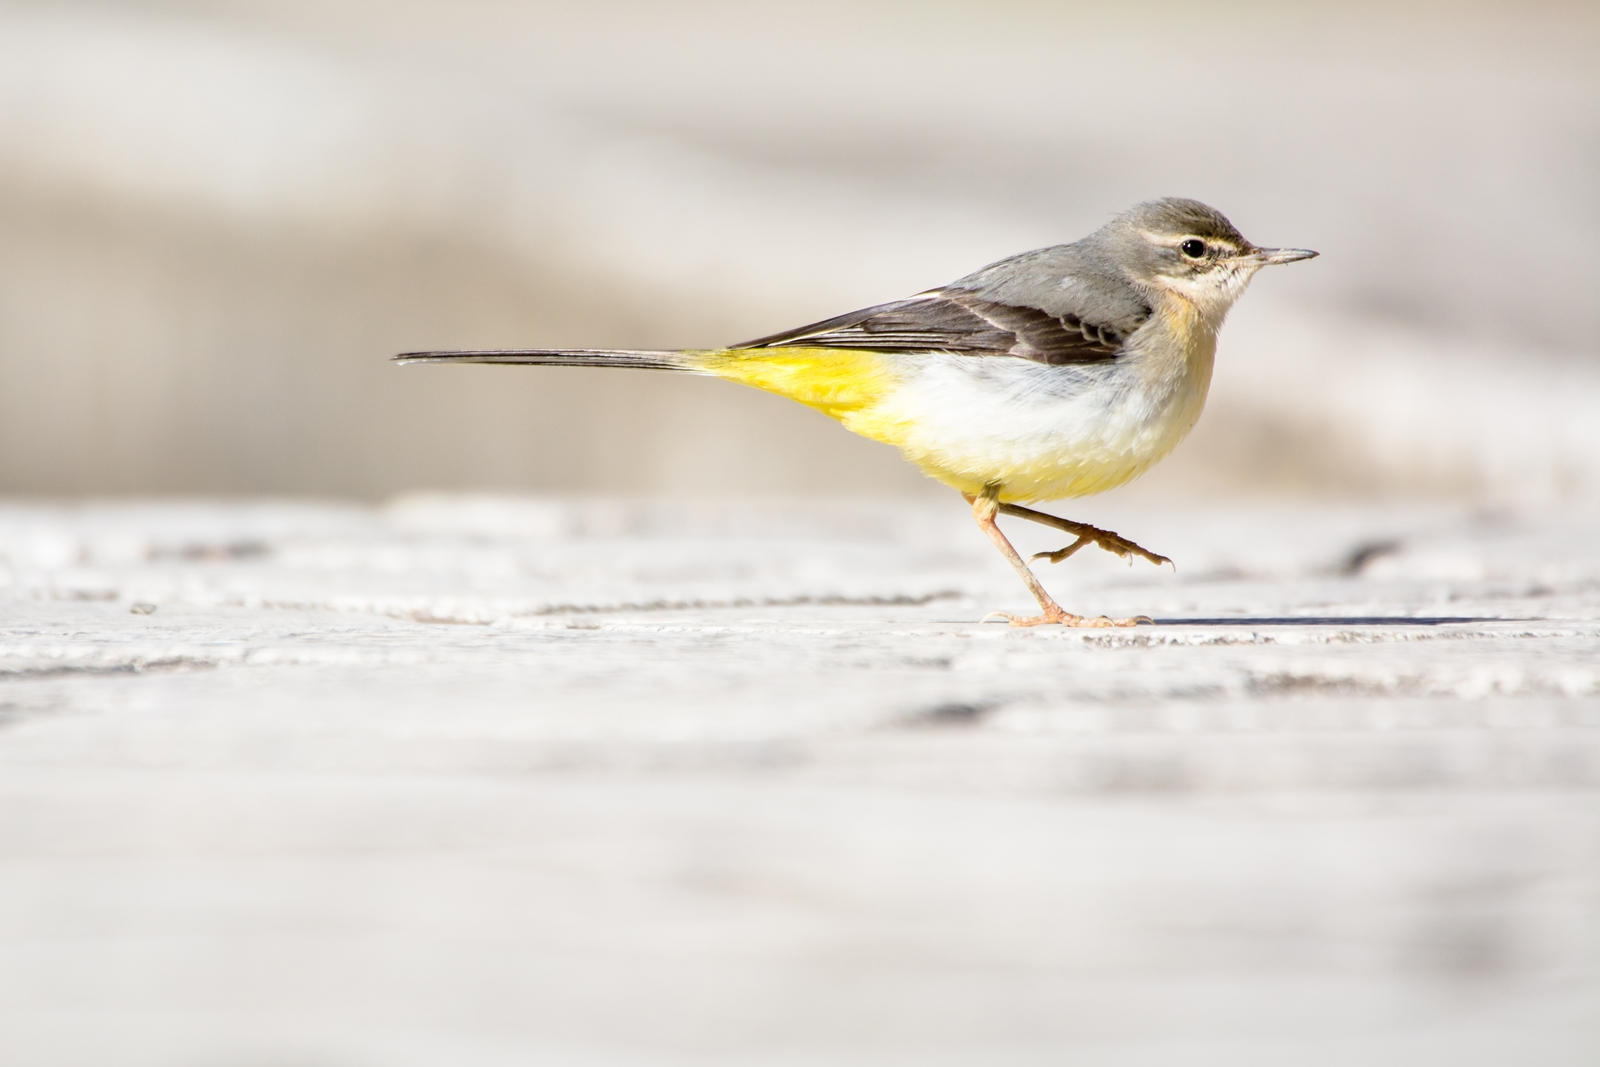 Photo: せかせか Walk in a hurry.  せかせか せかせか 急ぎ足 腹ごしらえに大忙し あっちへ行ったり こっちへ行ったり  Grey Wagtail. (キセキレイ)  #cooljapan #365cooljapanmay  #birdphotography #birds  #kawaii  Nikon D7100 SIGMA APO 50-500mm F5-6.3 DG OS HSM [ Day319, March 27th ]  小鳥の詩朗読 https://youtu.be/NSF8Jg4TAC0?list=PL2YtHGm0-R3qVsaqvQe9OYdJFCkI98wzF